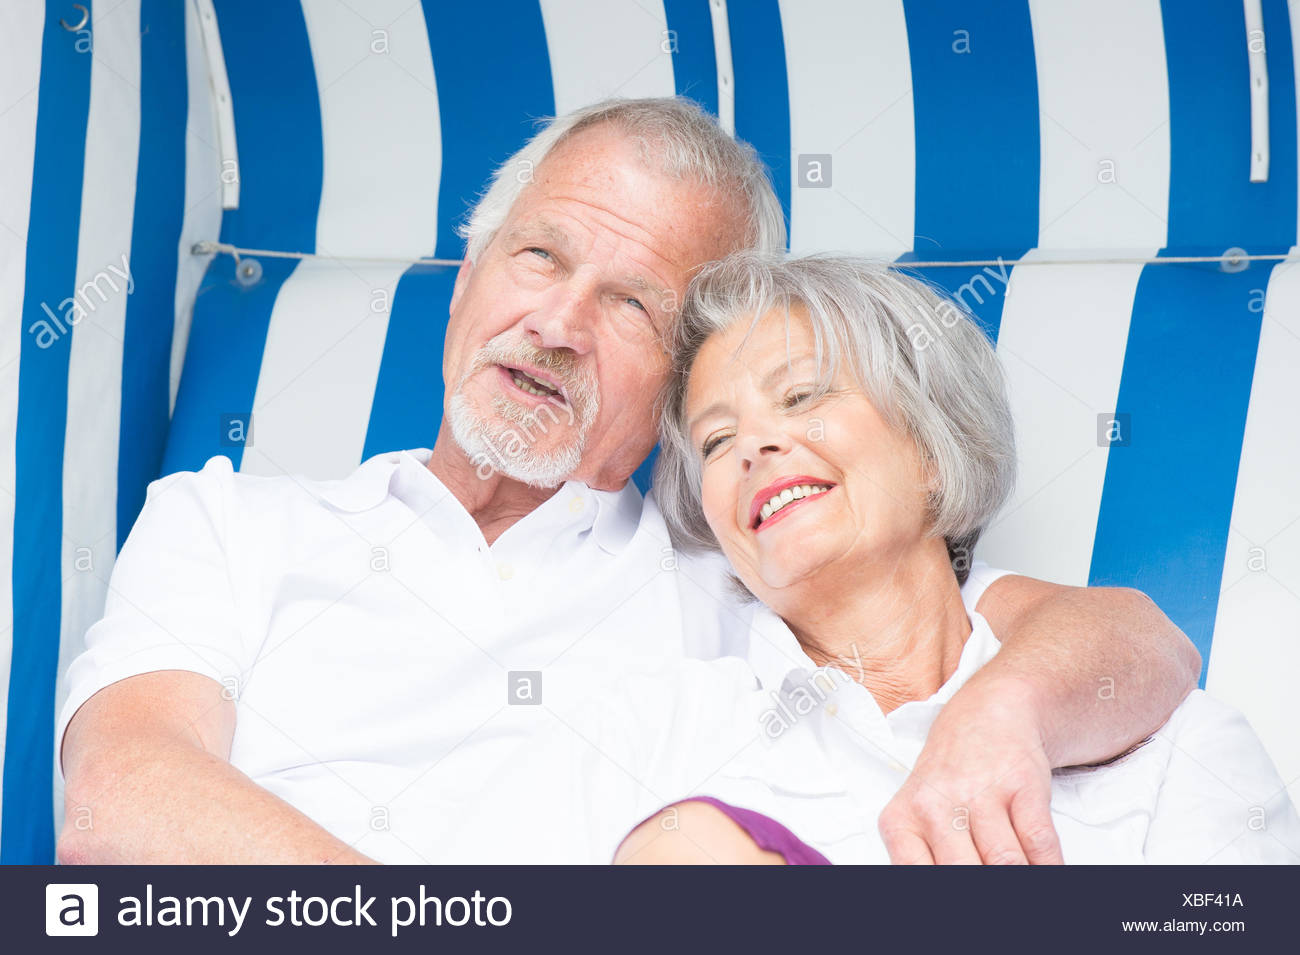 oap couple - Stock Image